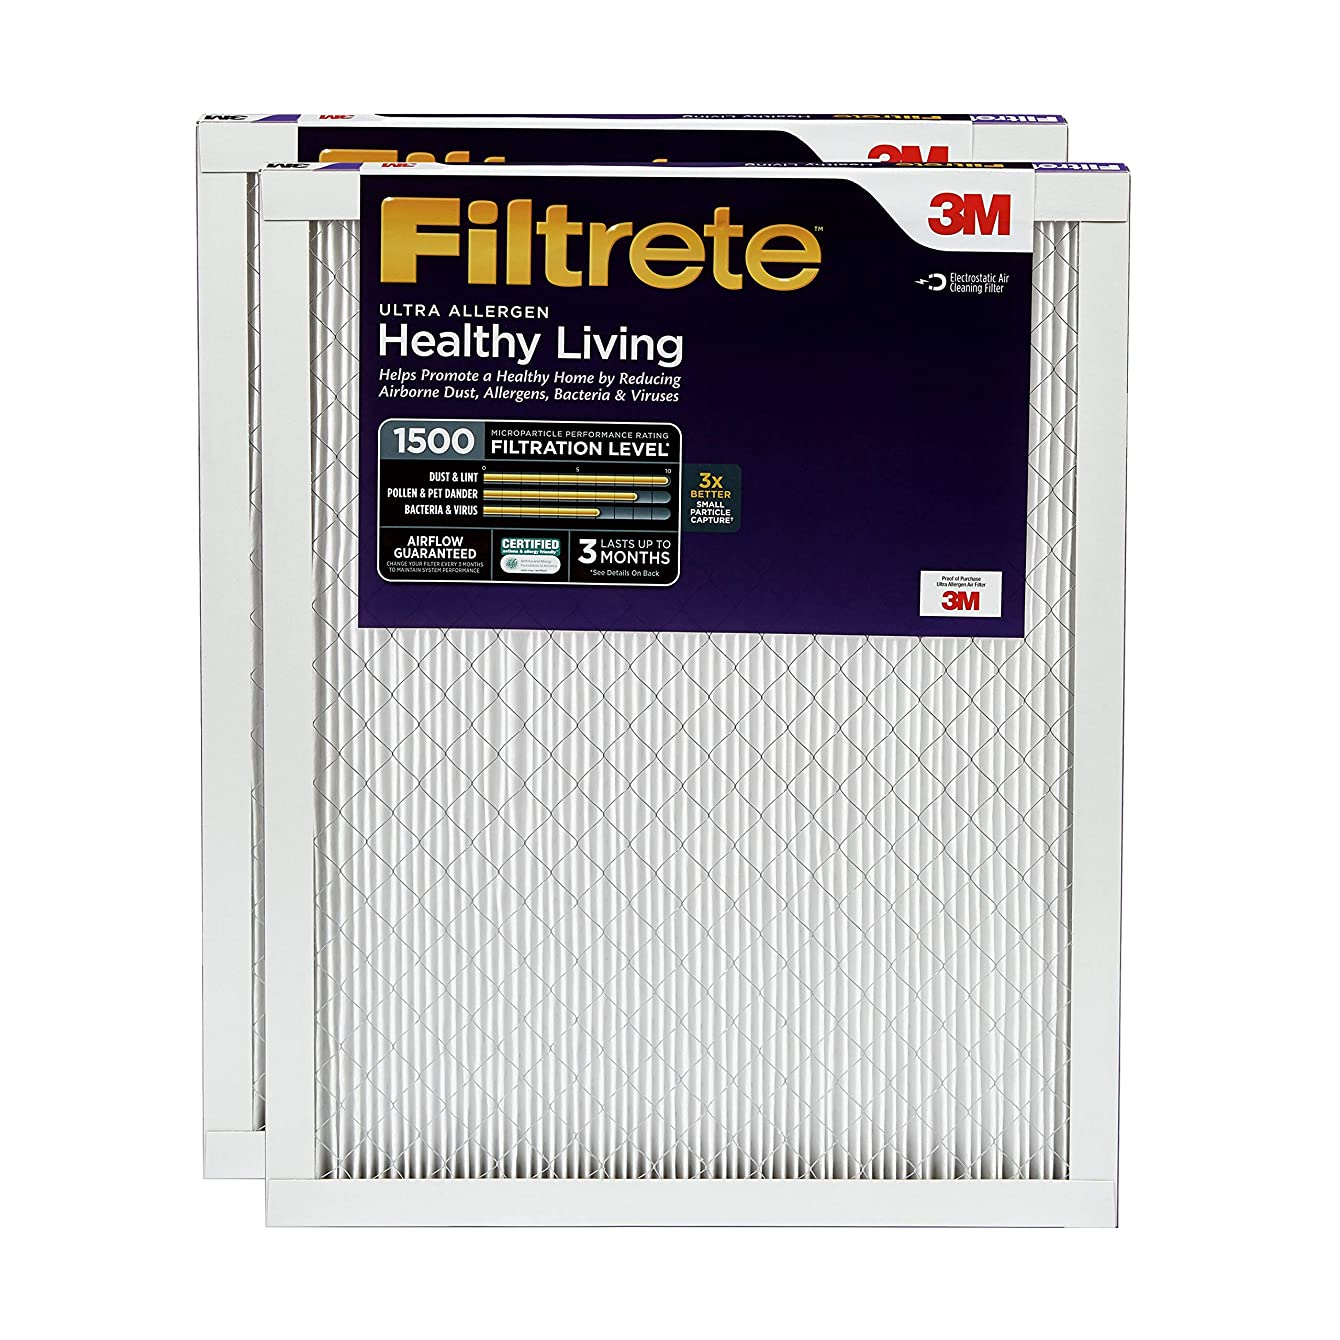 Filtrete 20x20x1, AC Furnace Air Filter, MPR 1500, Healthy Living Ultra Allergen, 2-Pack